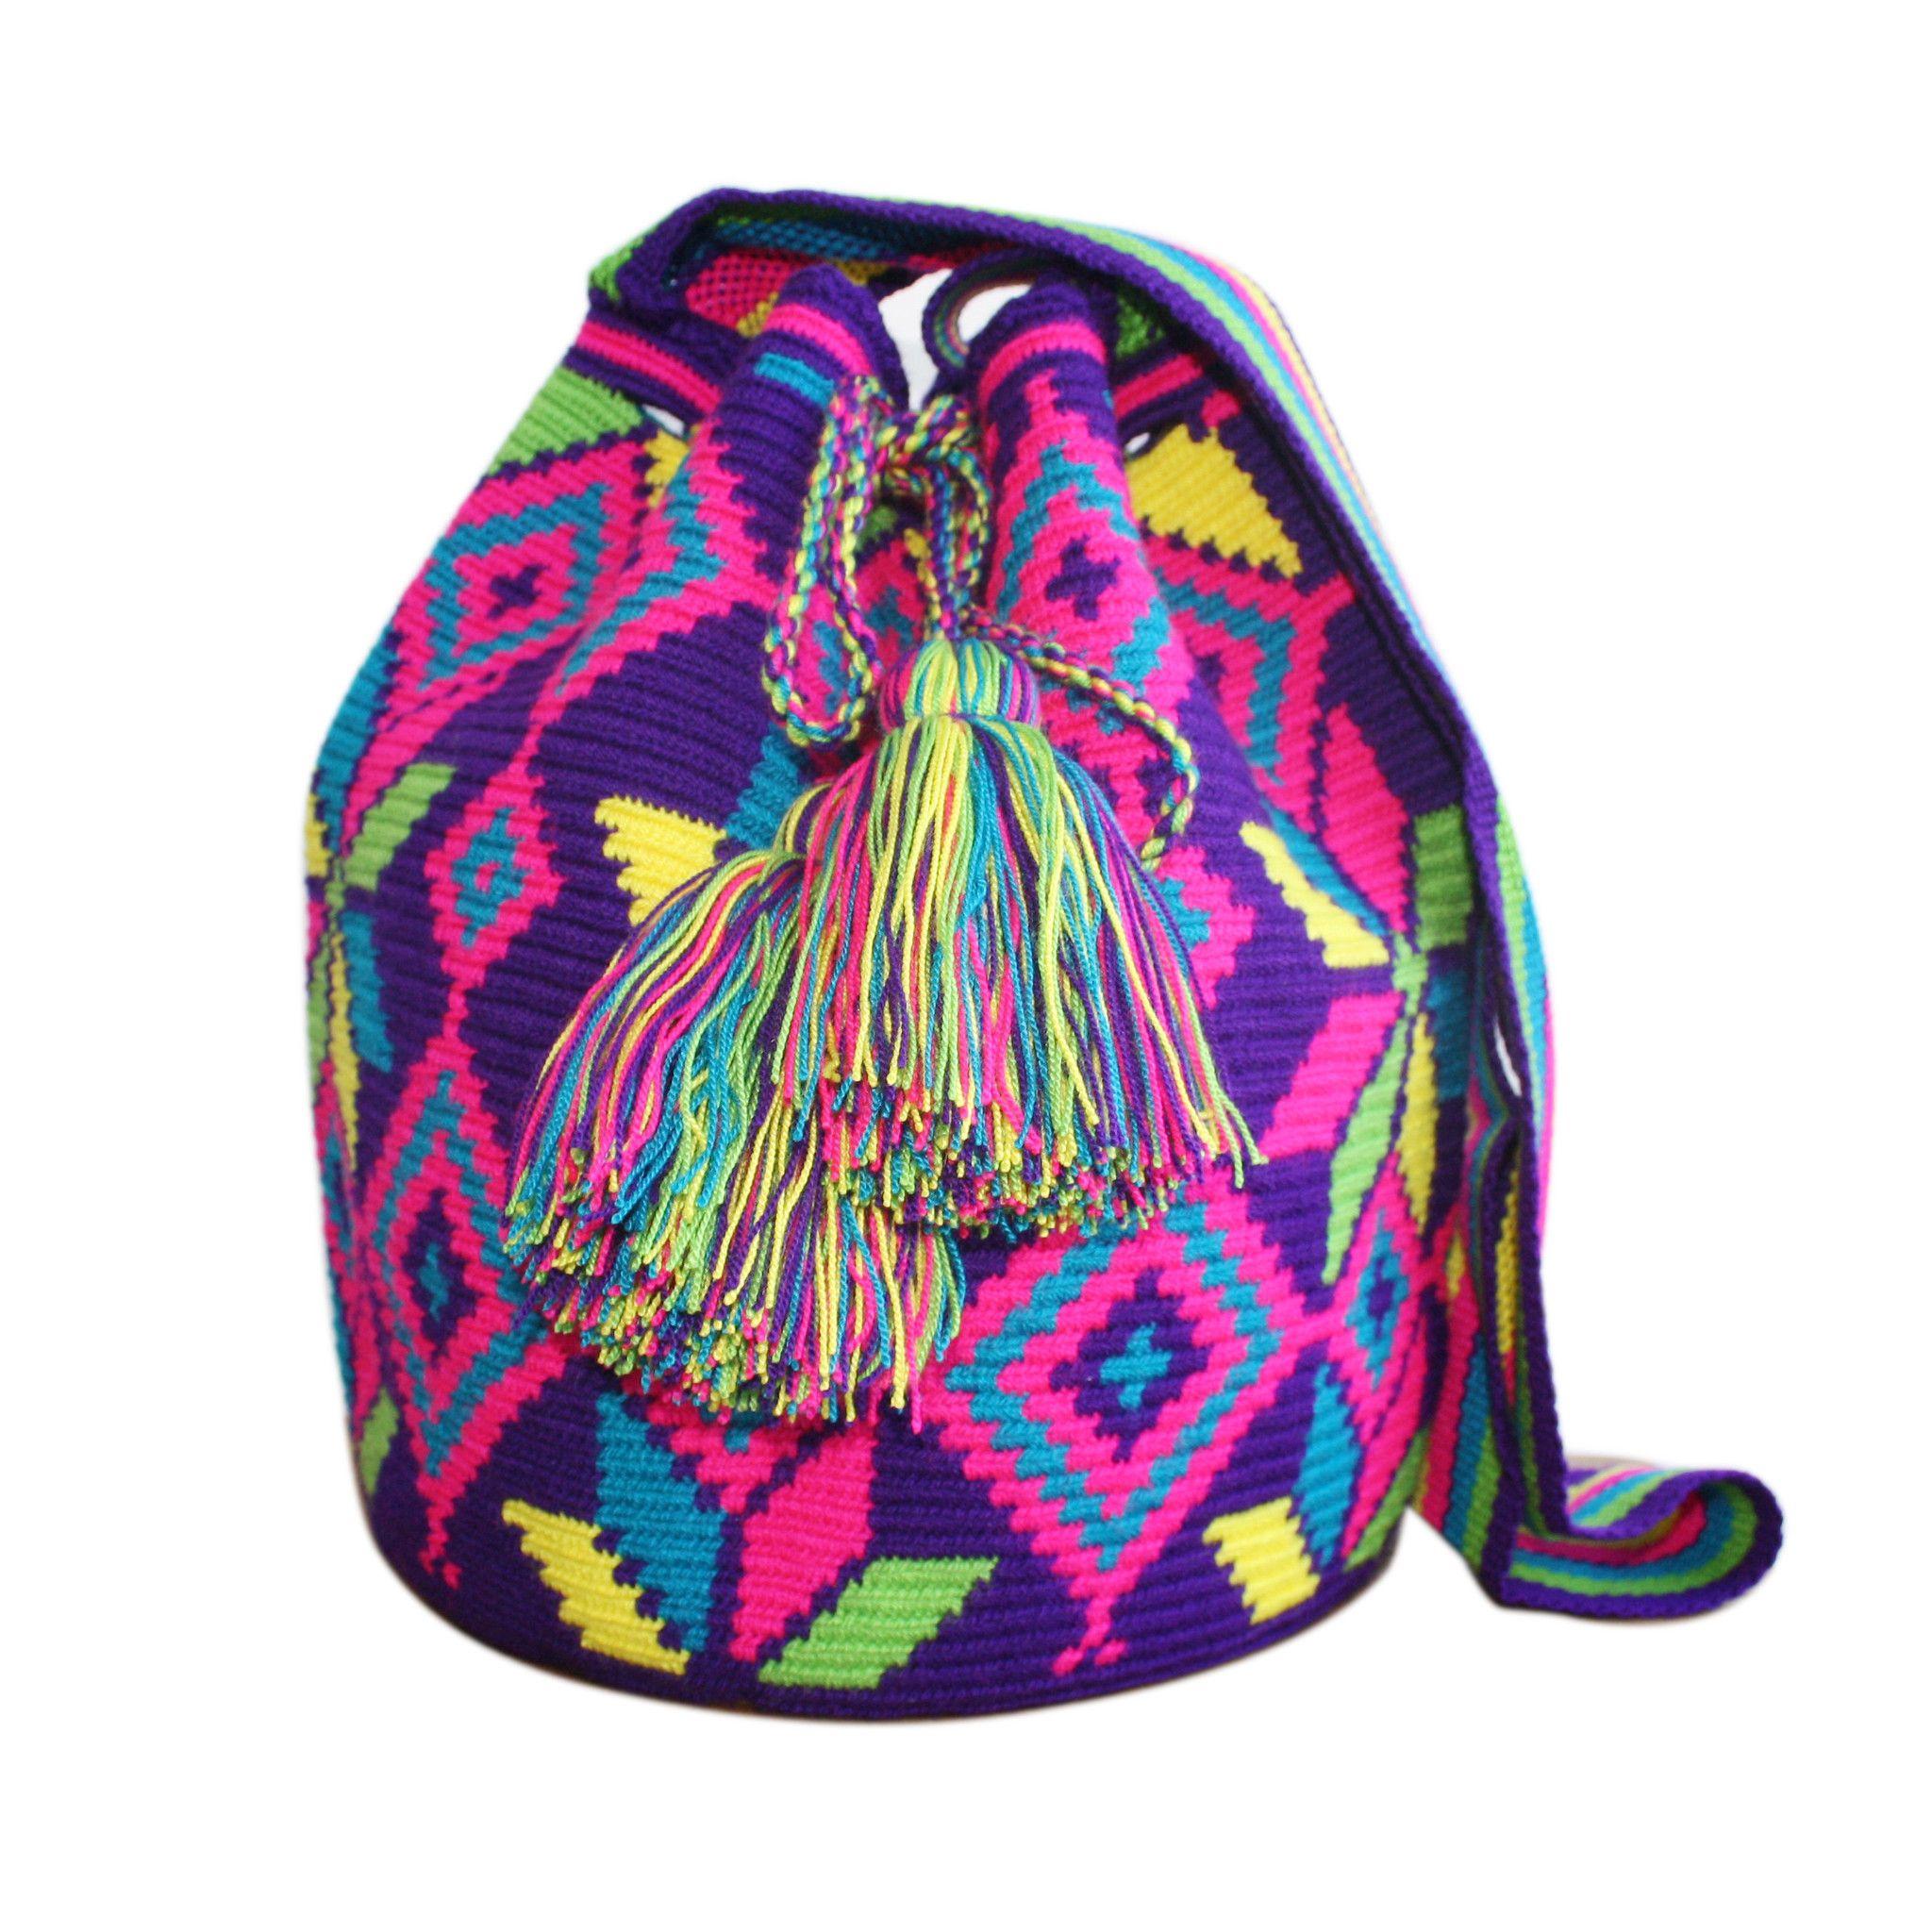 Wayuu Mochila Luciana bag at crystalcovecollective.com.au